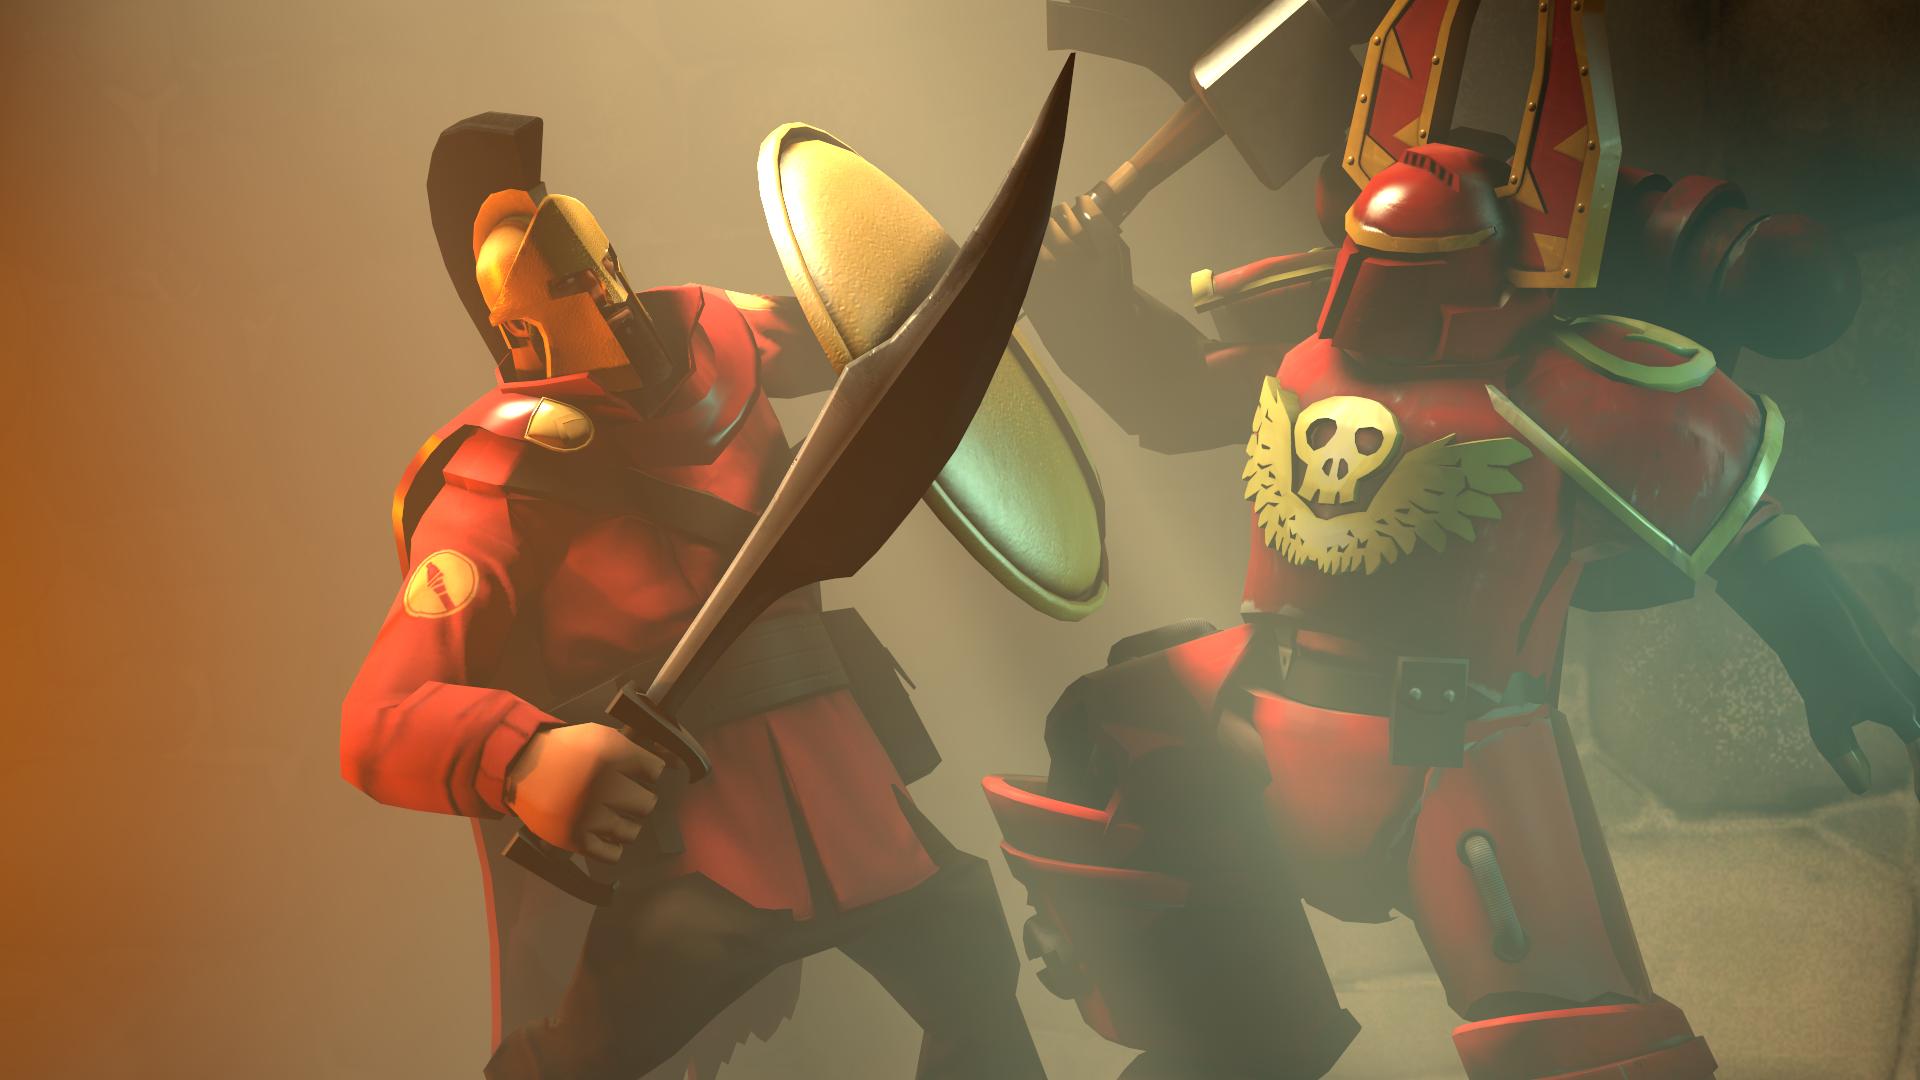 Spartan vs Khorne berserker by zOMG-a-DropBear on DeviantArt